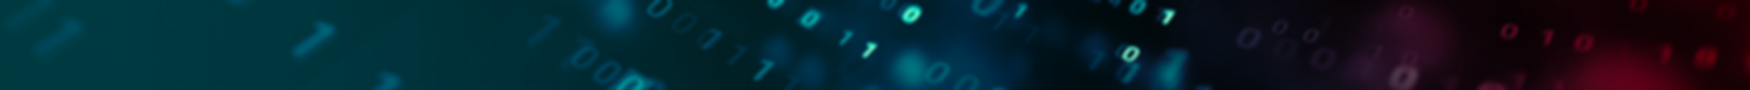 Hackers_Challange_Web_2.png